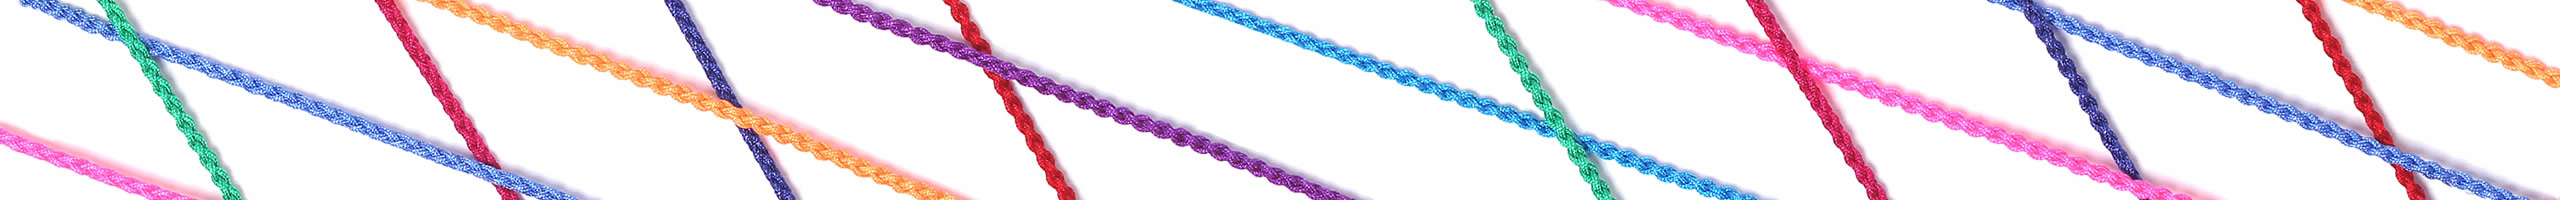 Плетеный шелковый шнур